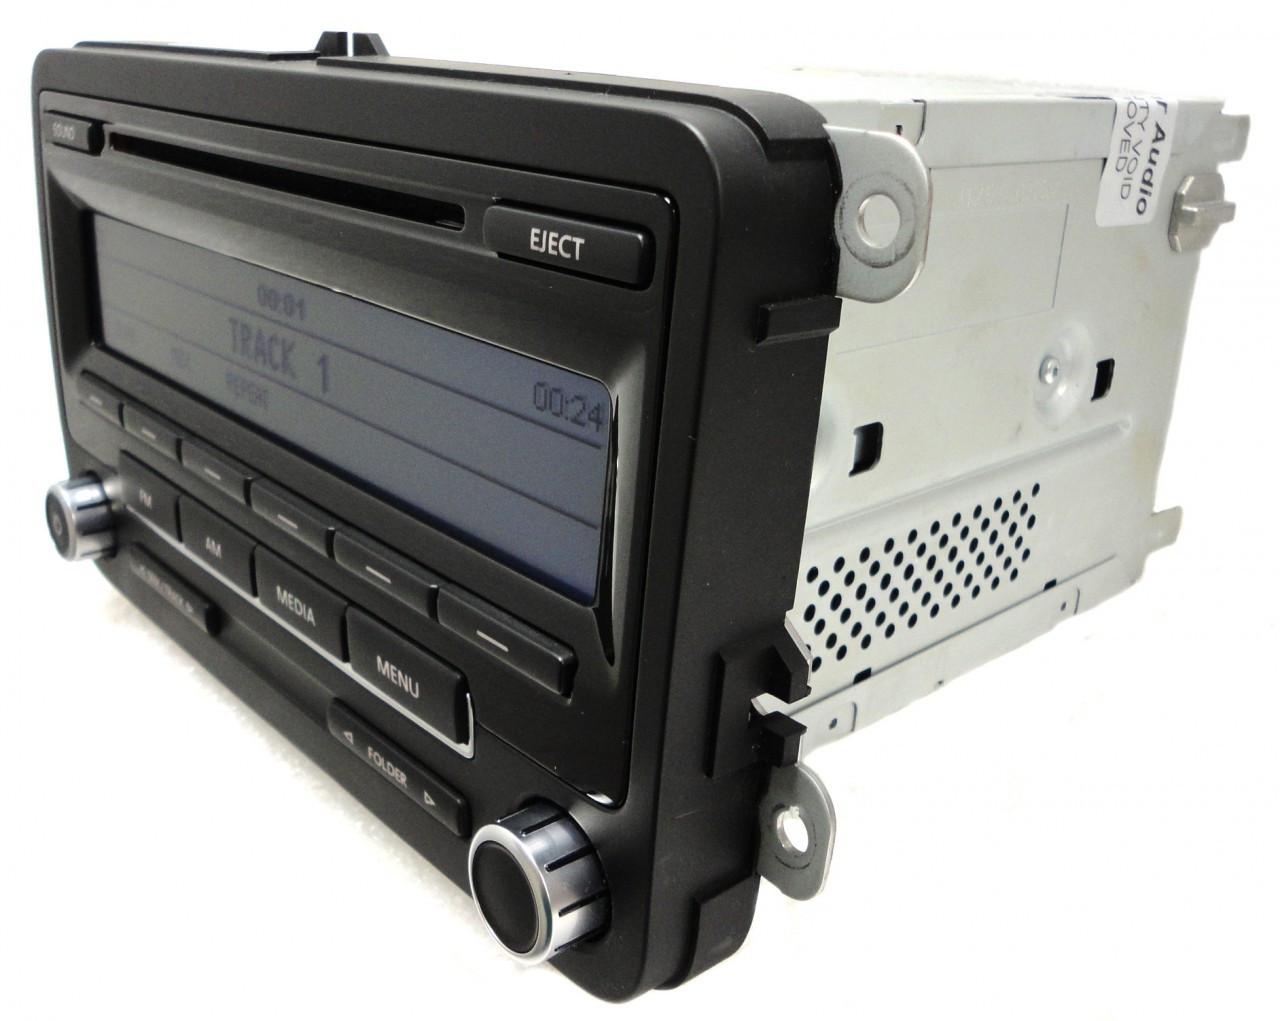 VW VOLKSWAGEN Jetta Passat Golf EOS CC GTI Tiguan Beetle AM FM Radio Stereo  MP3 CD Player Bluetooth 1K0 035 164 A 2010 2011 2012 2013 OEM